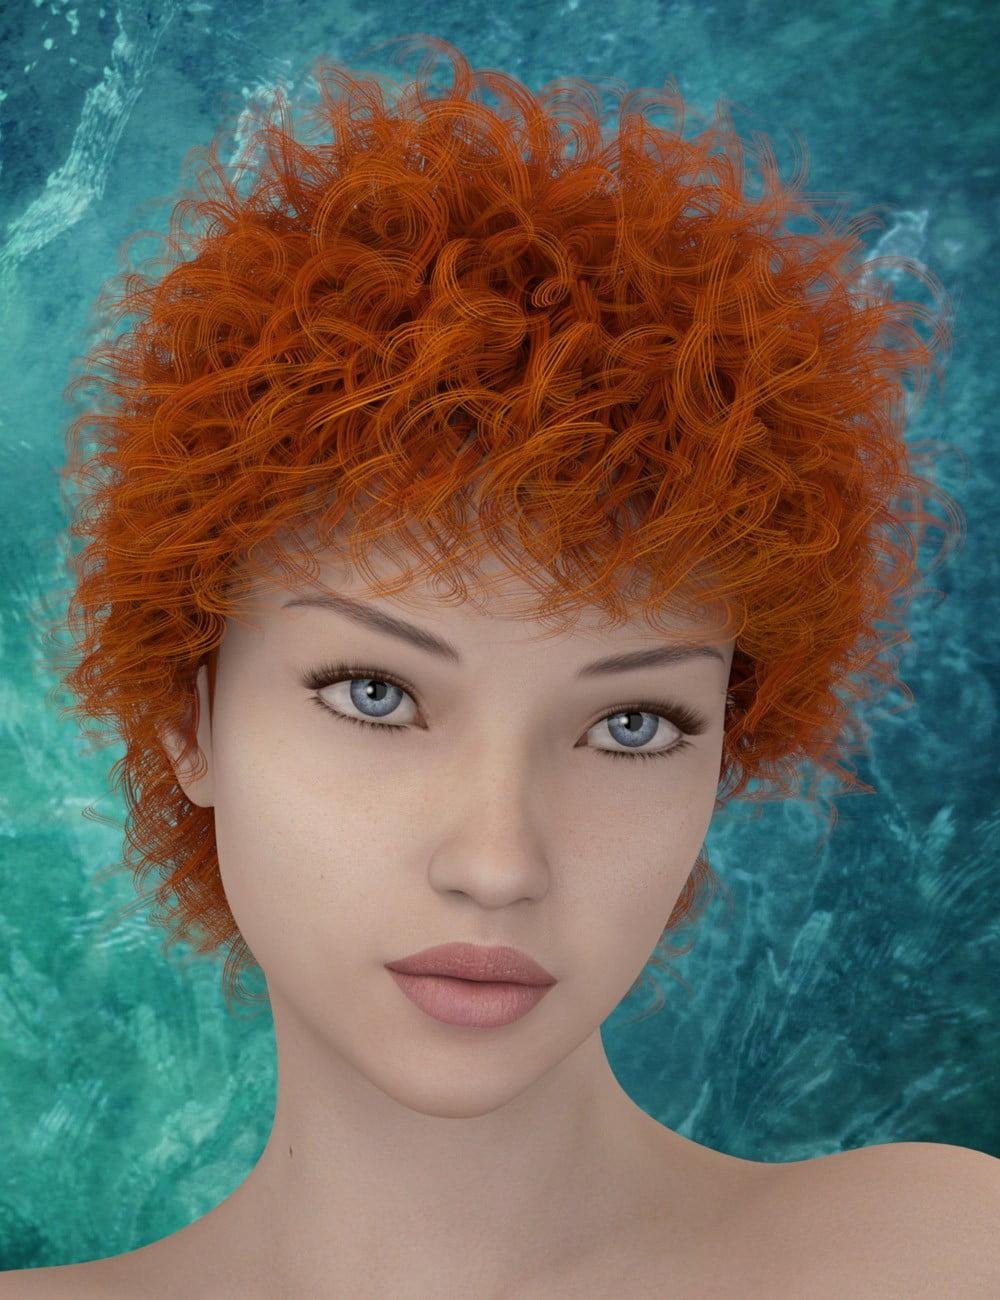 01-mairia-hair-for-genesis-3-females-and-males-daz3d